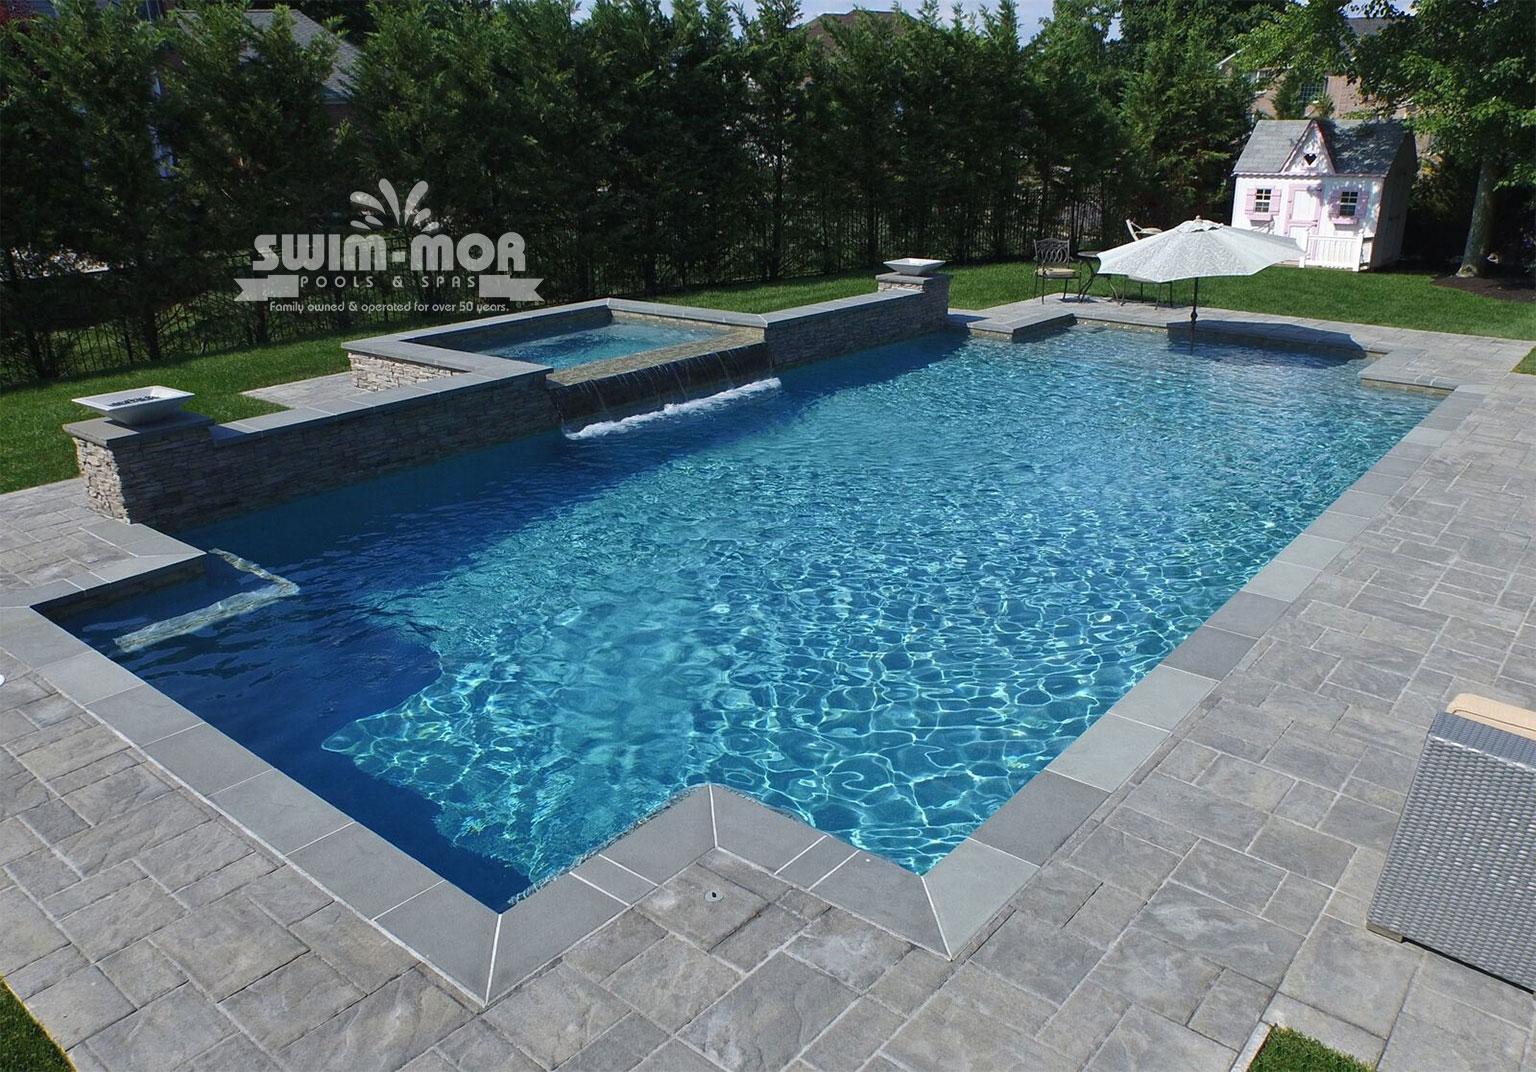 classic pool designs swim mor pools